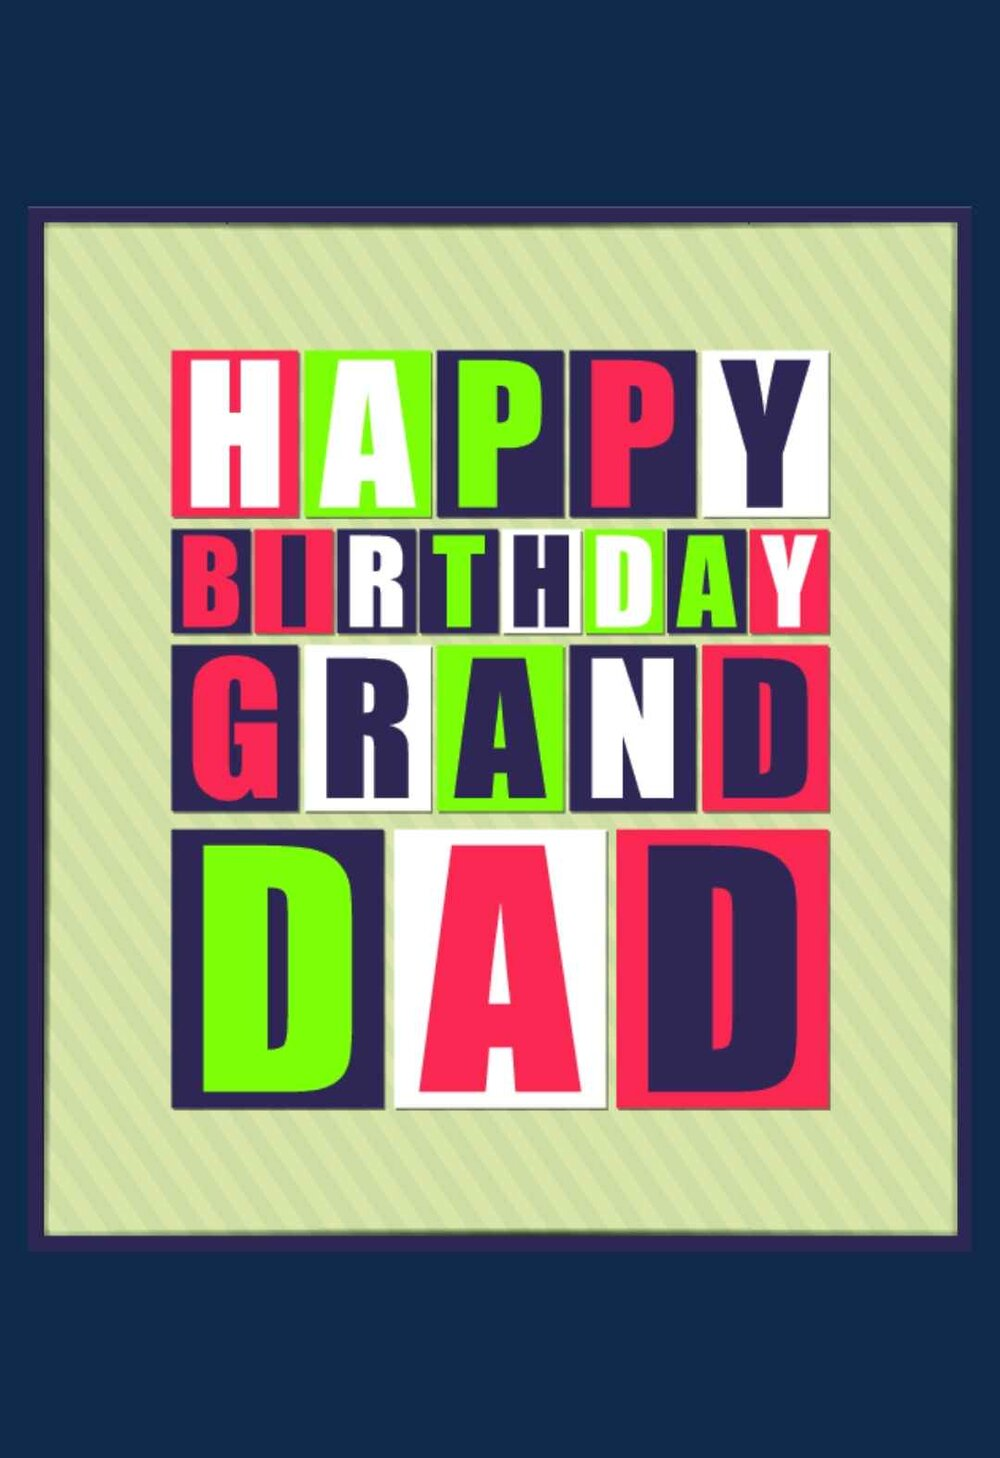 Grandfather Printable Birthday Cards Printbirthday Cards